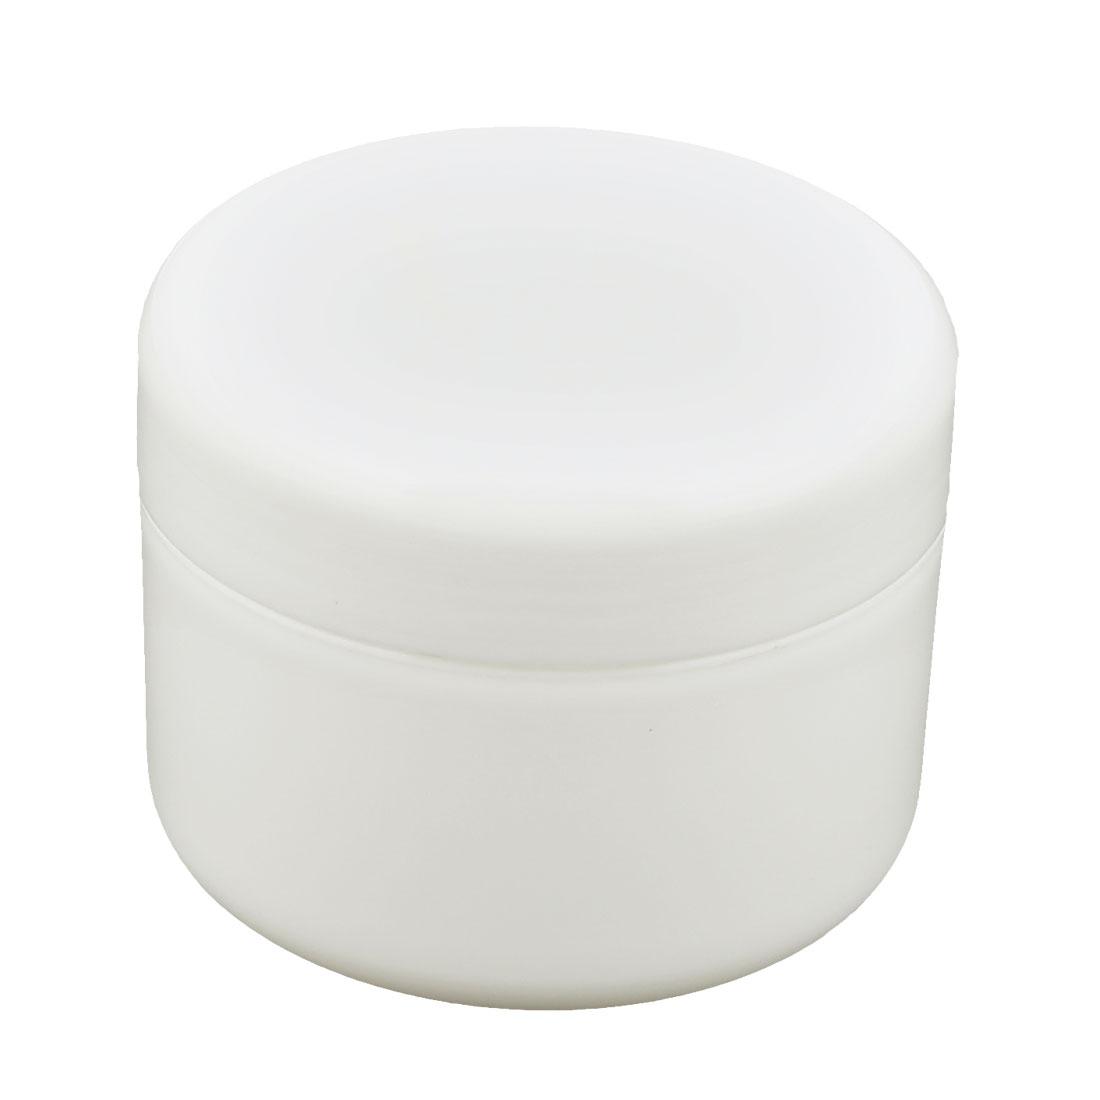 Women Plastic Makeup Cosmetic Empty Jar Pot Face Cream Skin Lotion Moisturizer Bottle Container